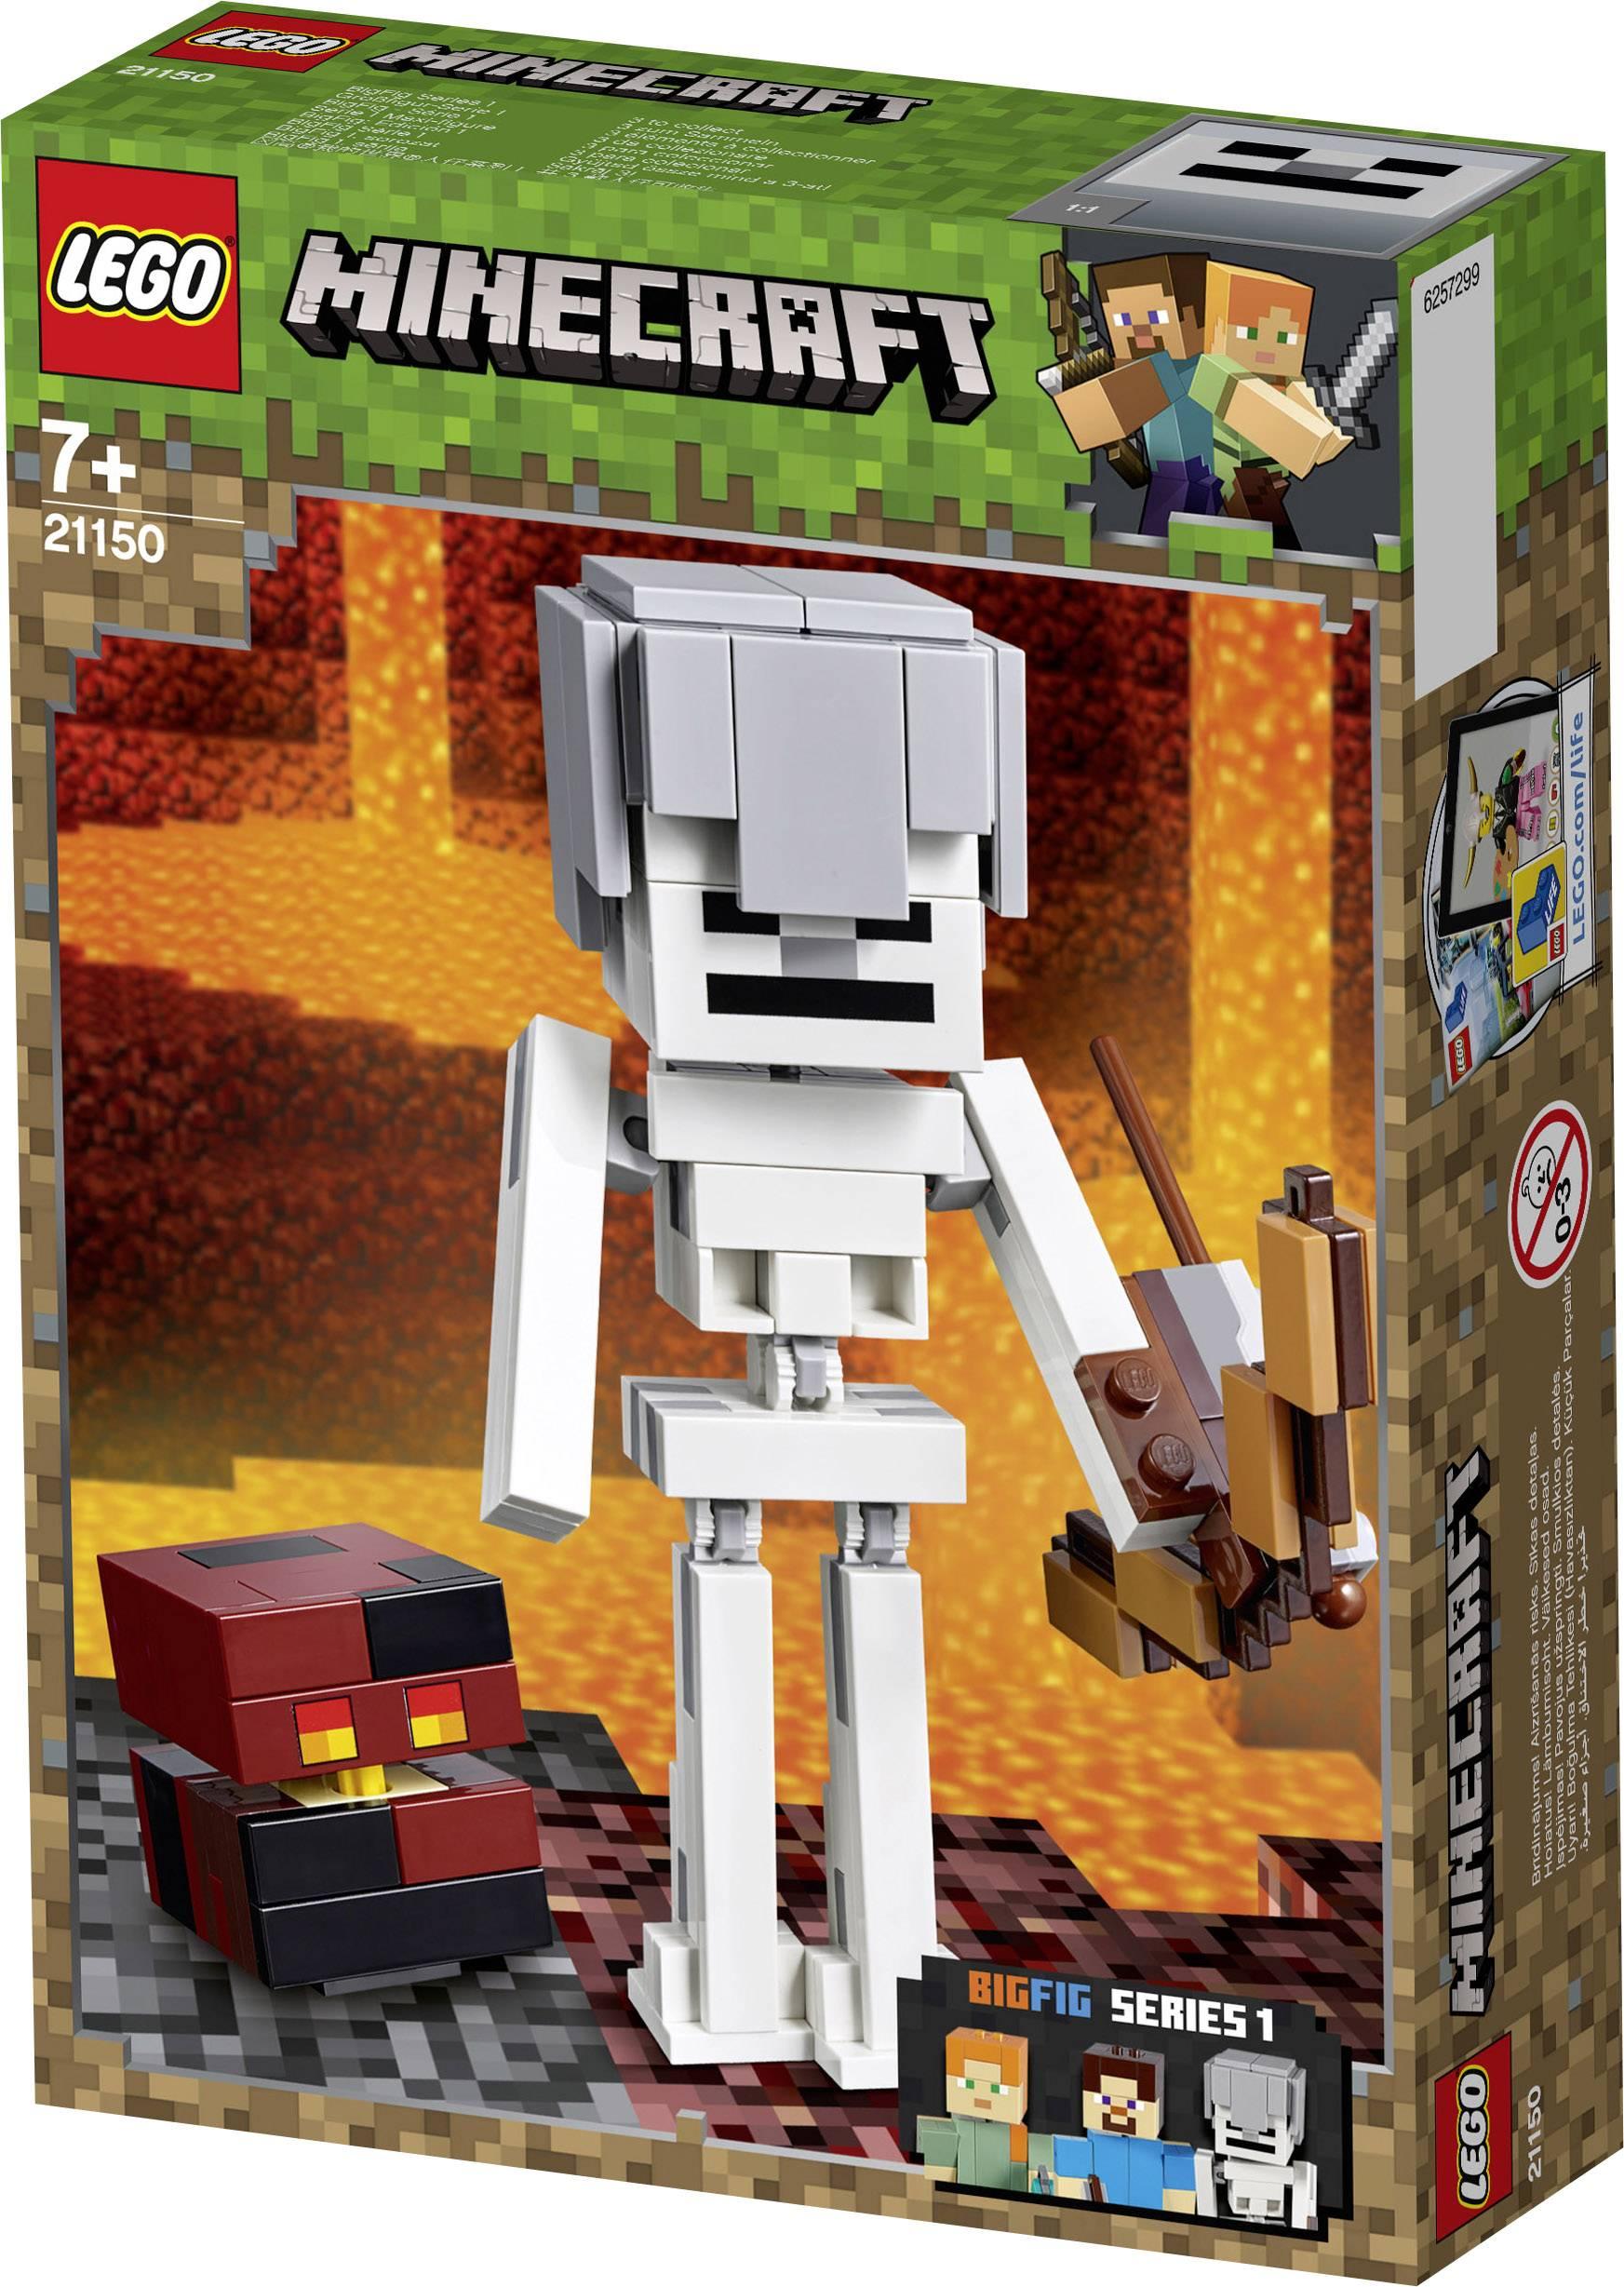 LEGO ® Minecraft ™ 21150 Minecraft ™ bigfig squelette avec Magma Cube